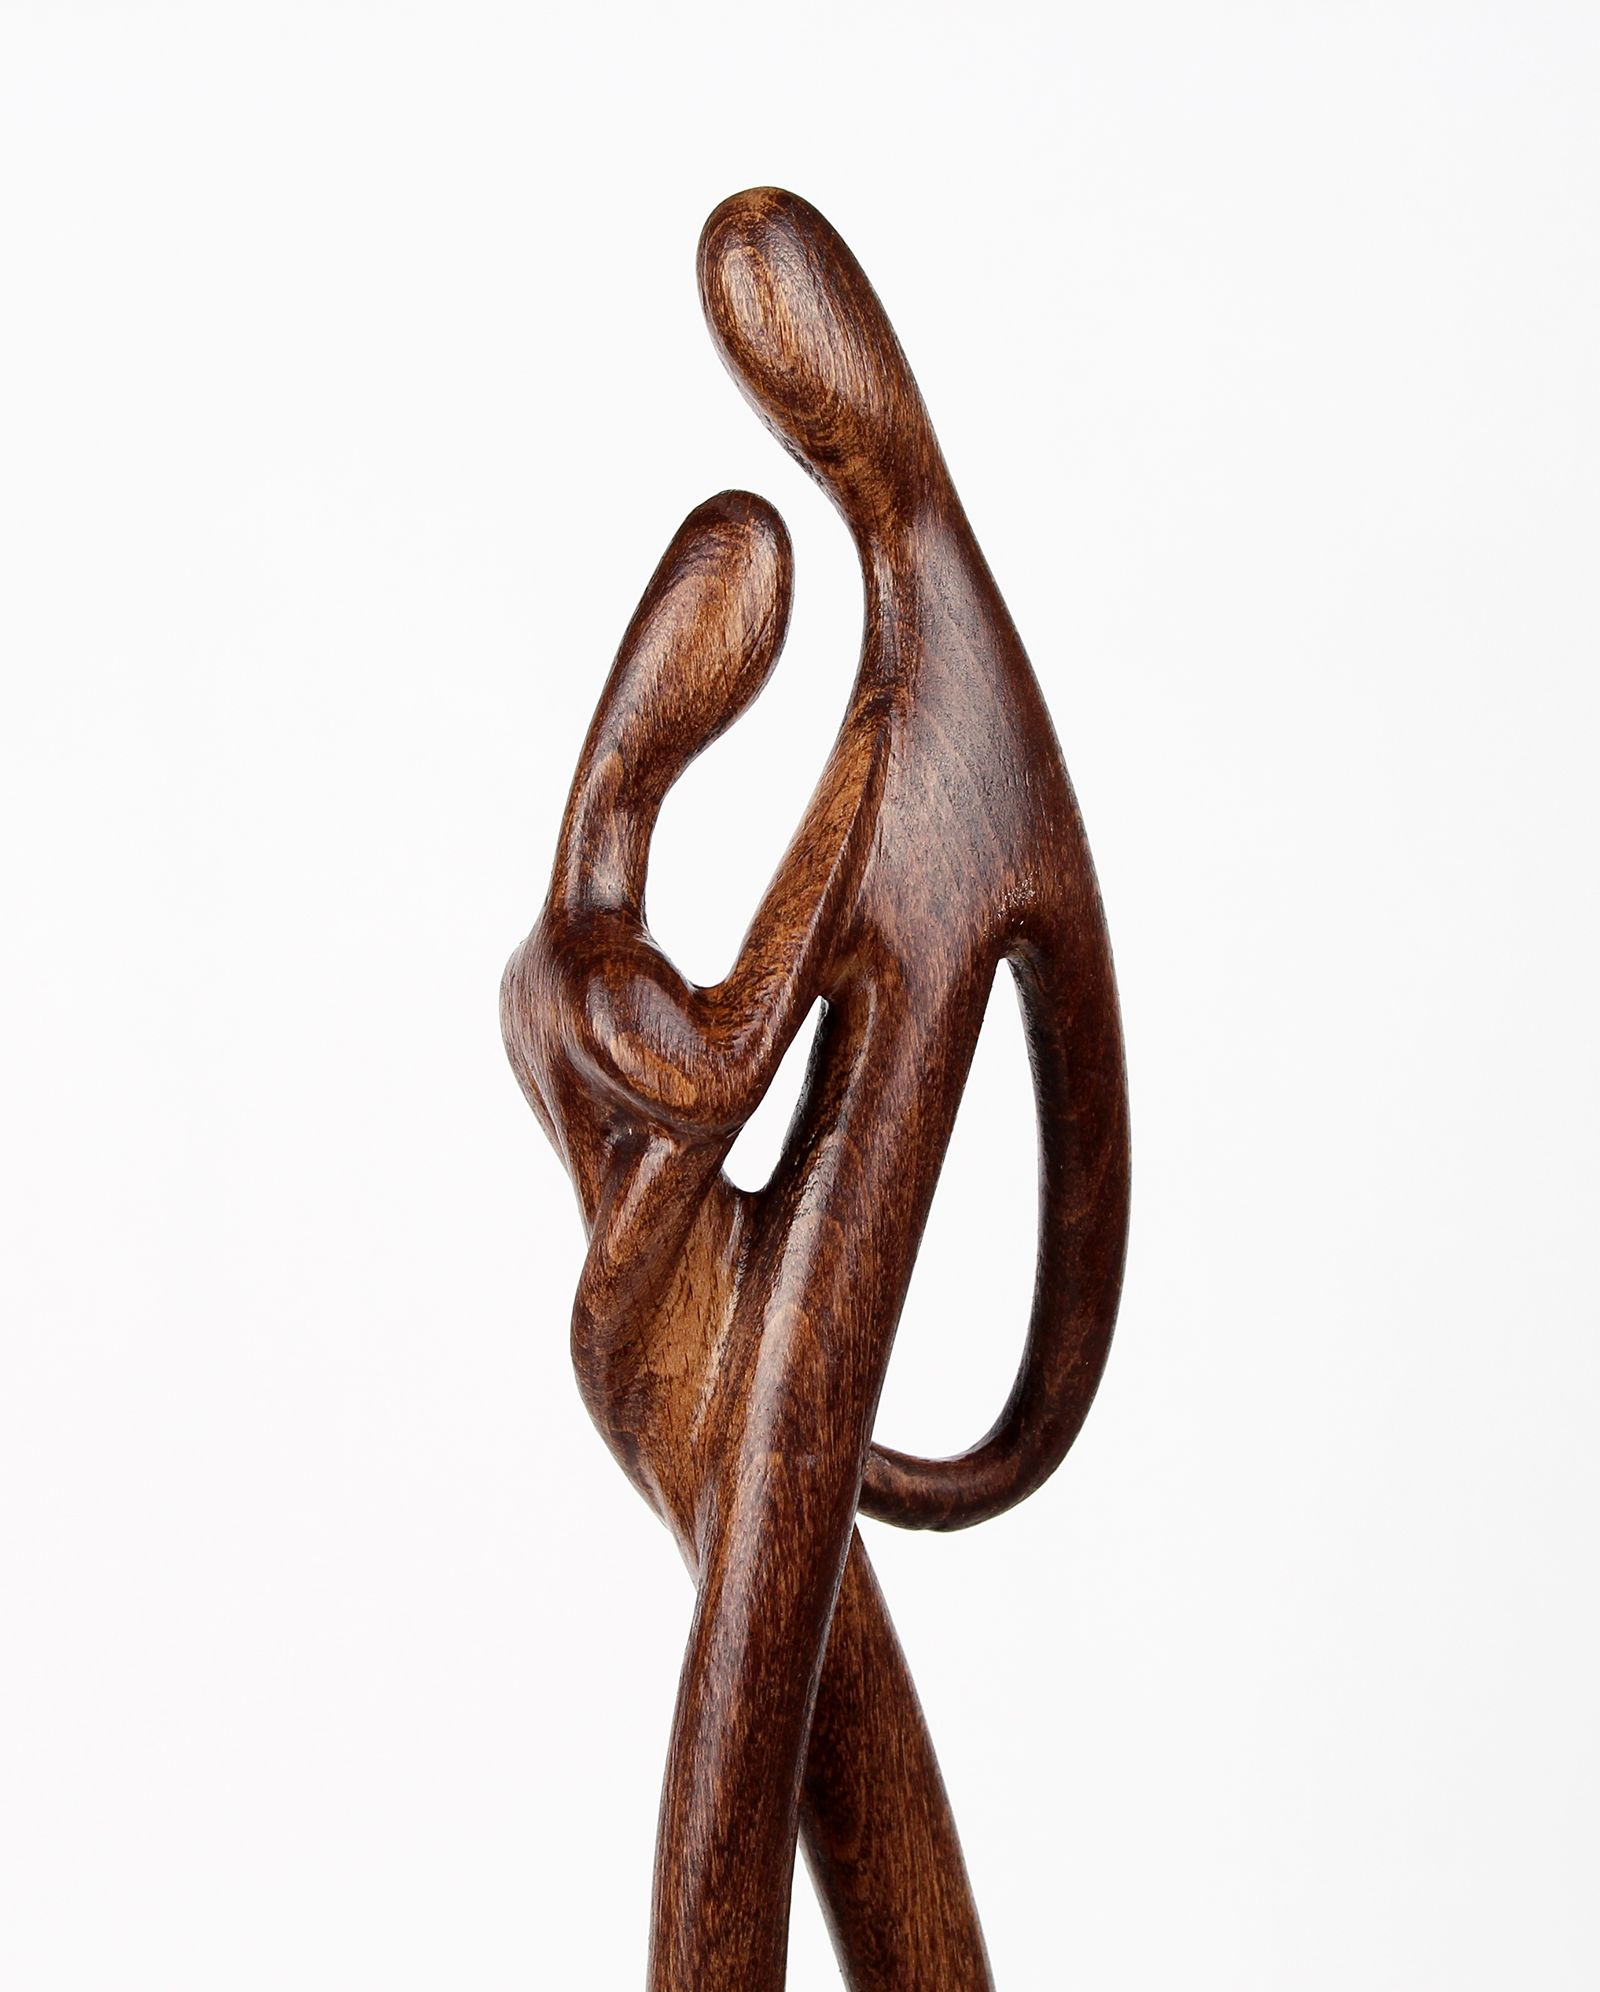 CLEARANCE SALE Romantic Couple Anniversary Gift Bronze Sculpture Statue Art Deco